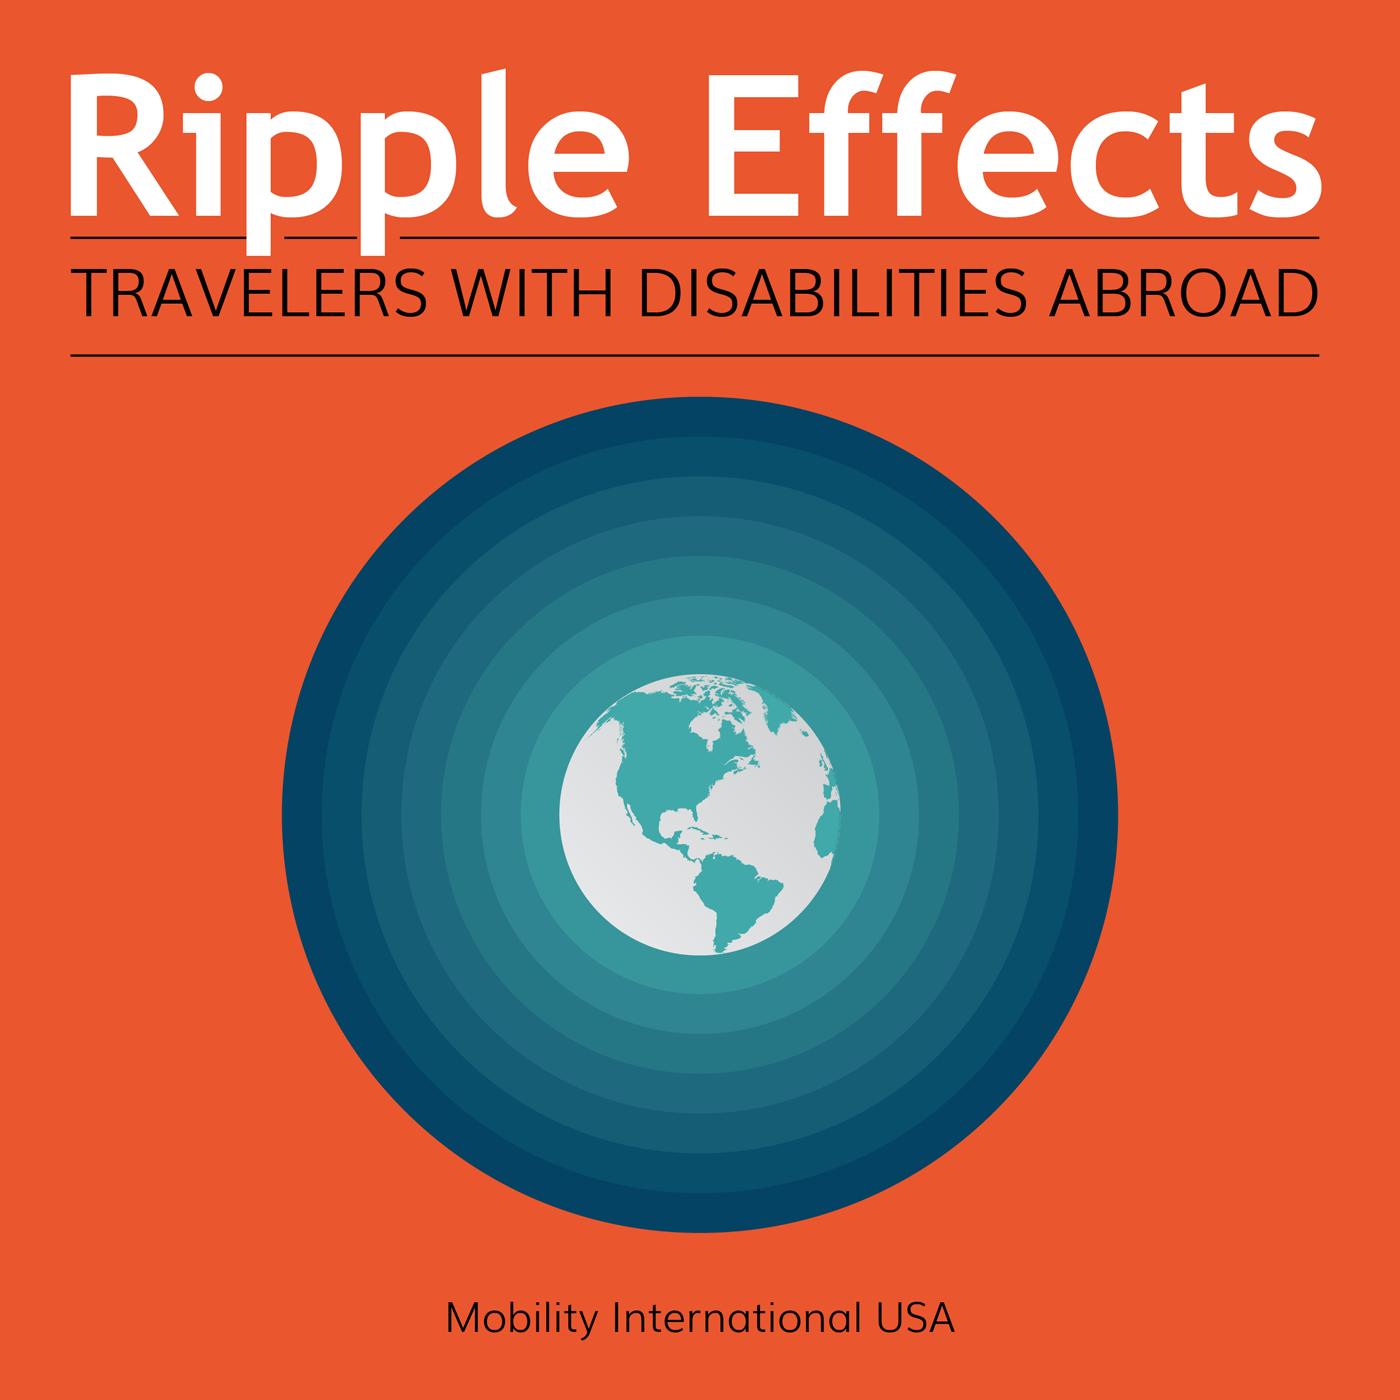 Ripple Effects